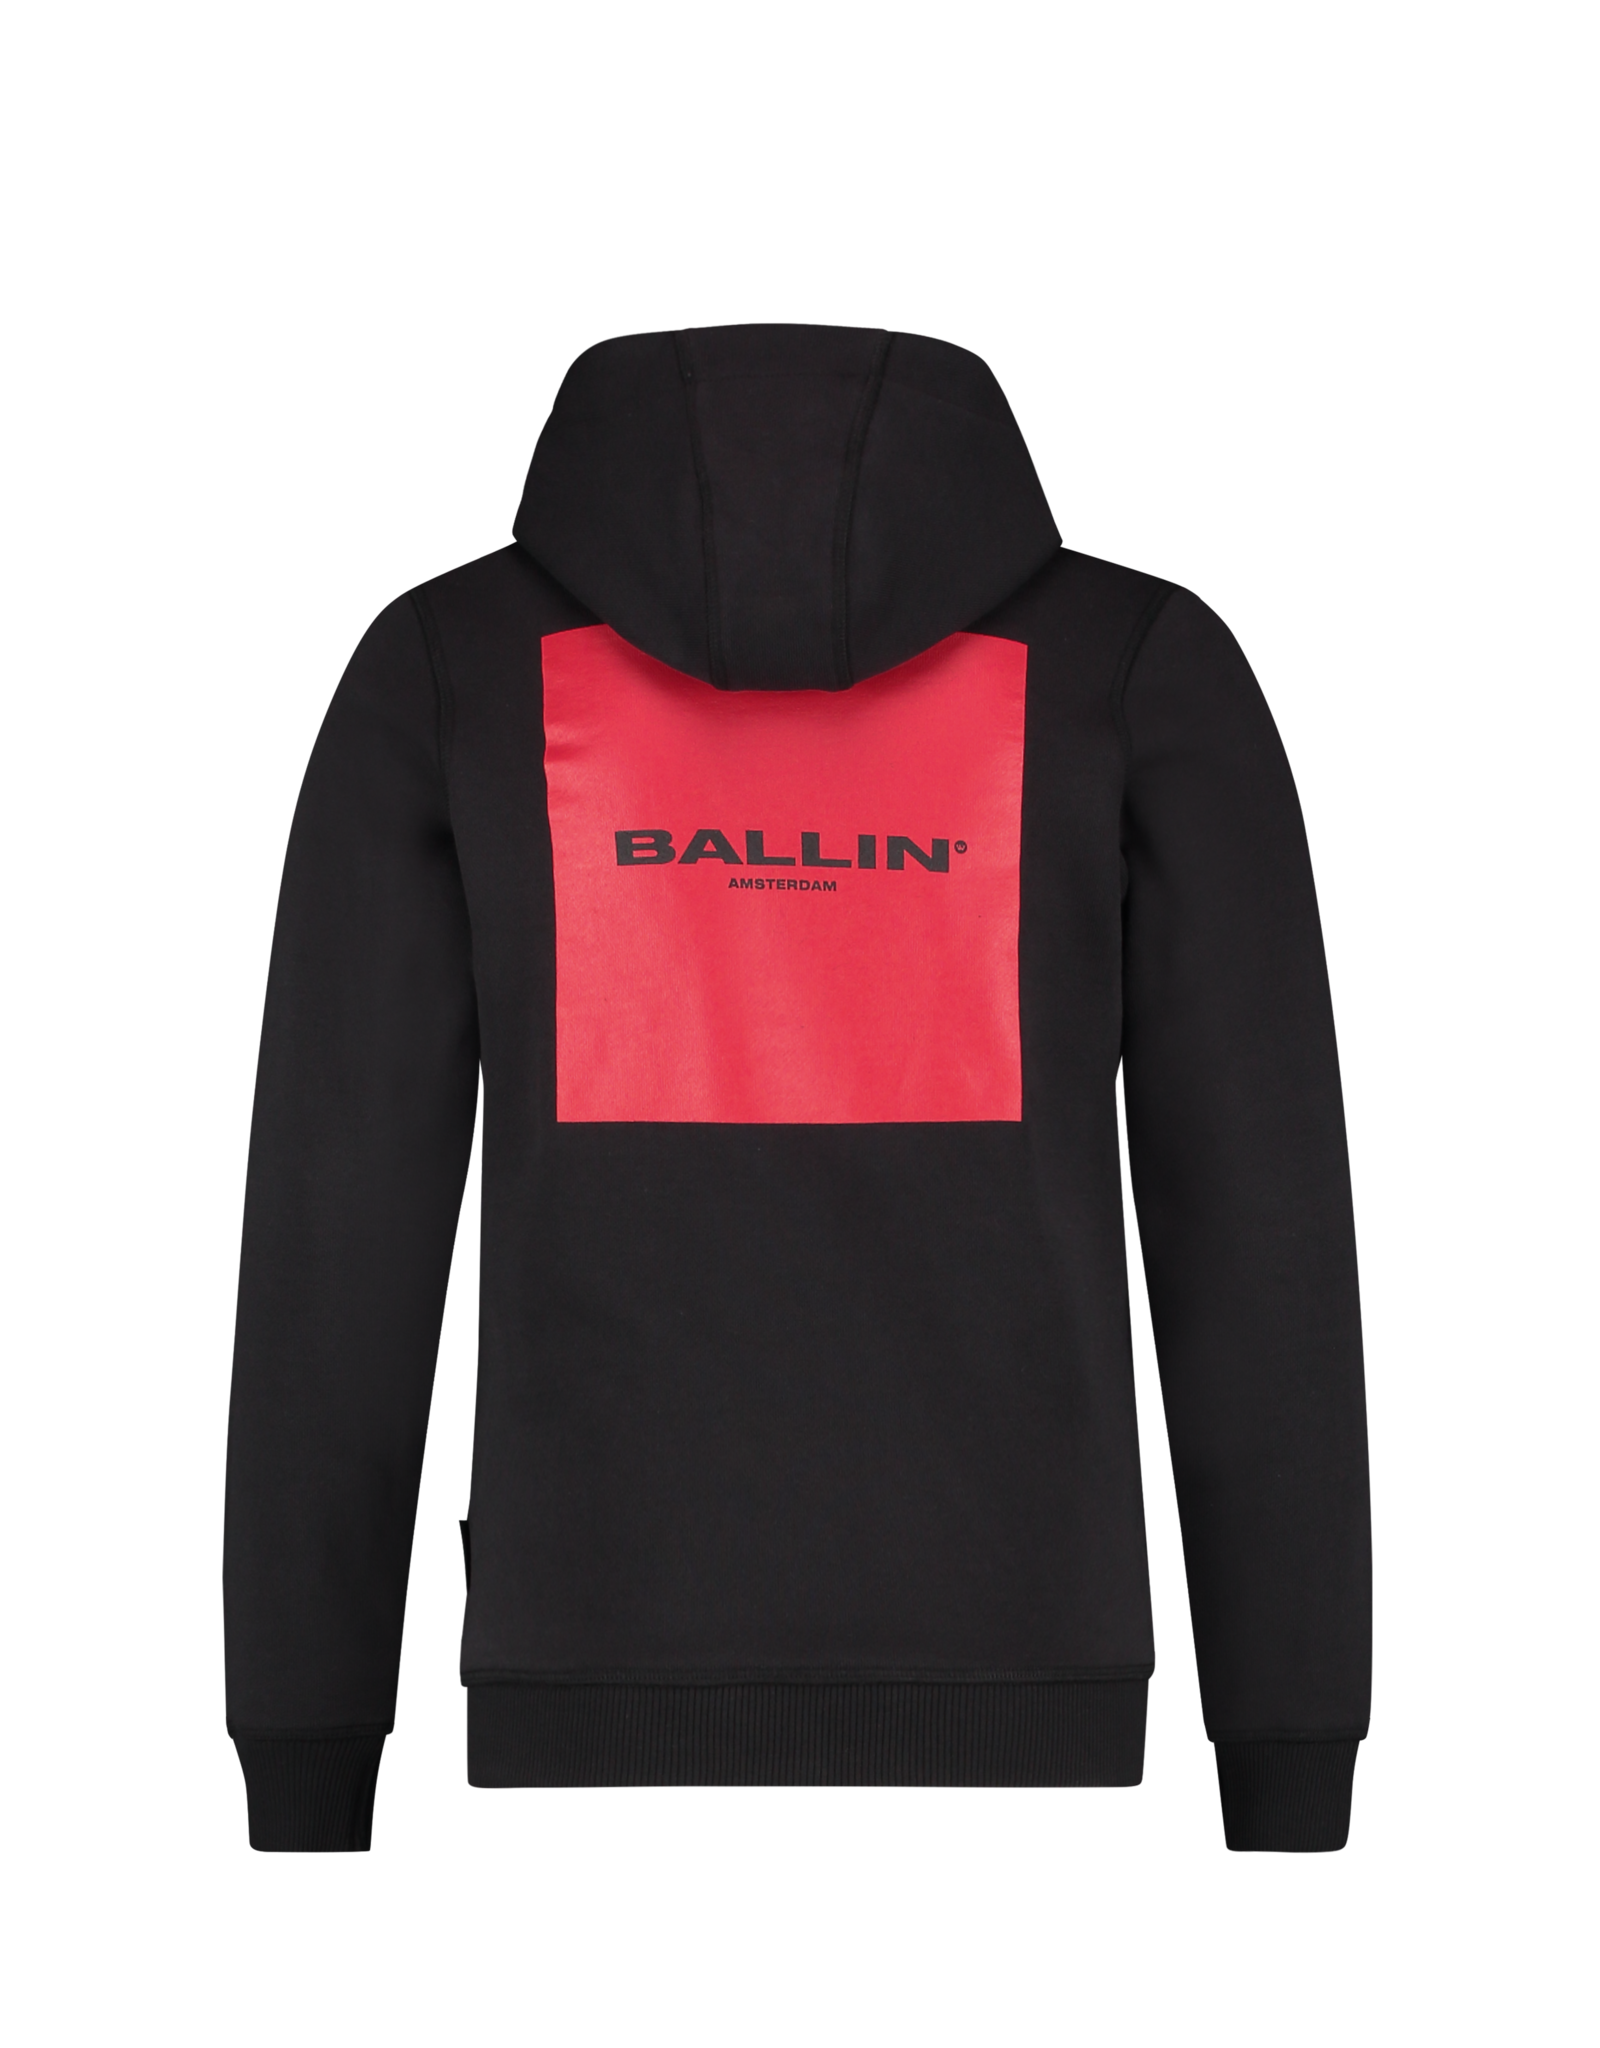 Ballin Amsterdam Cardigan Black